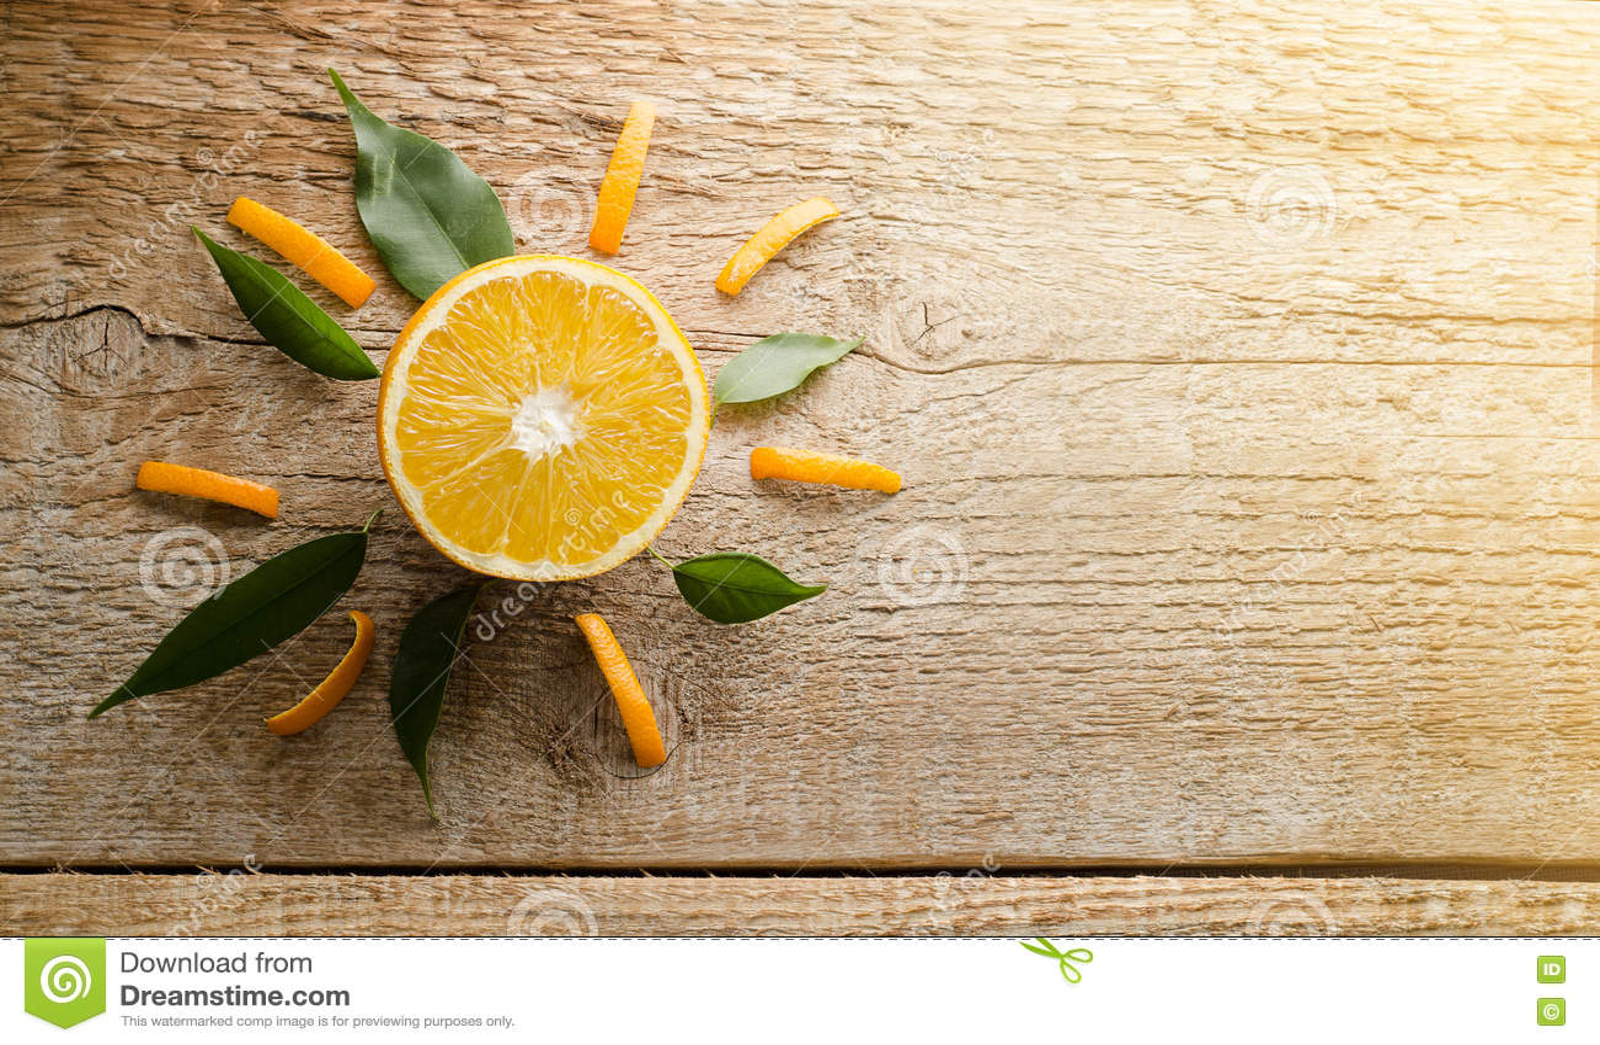 Artistic image of orange